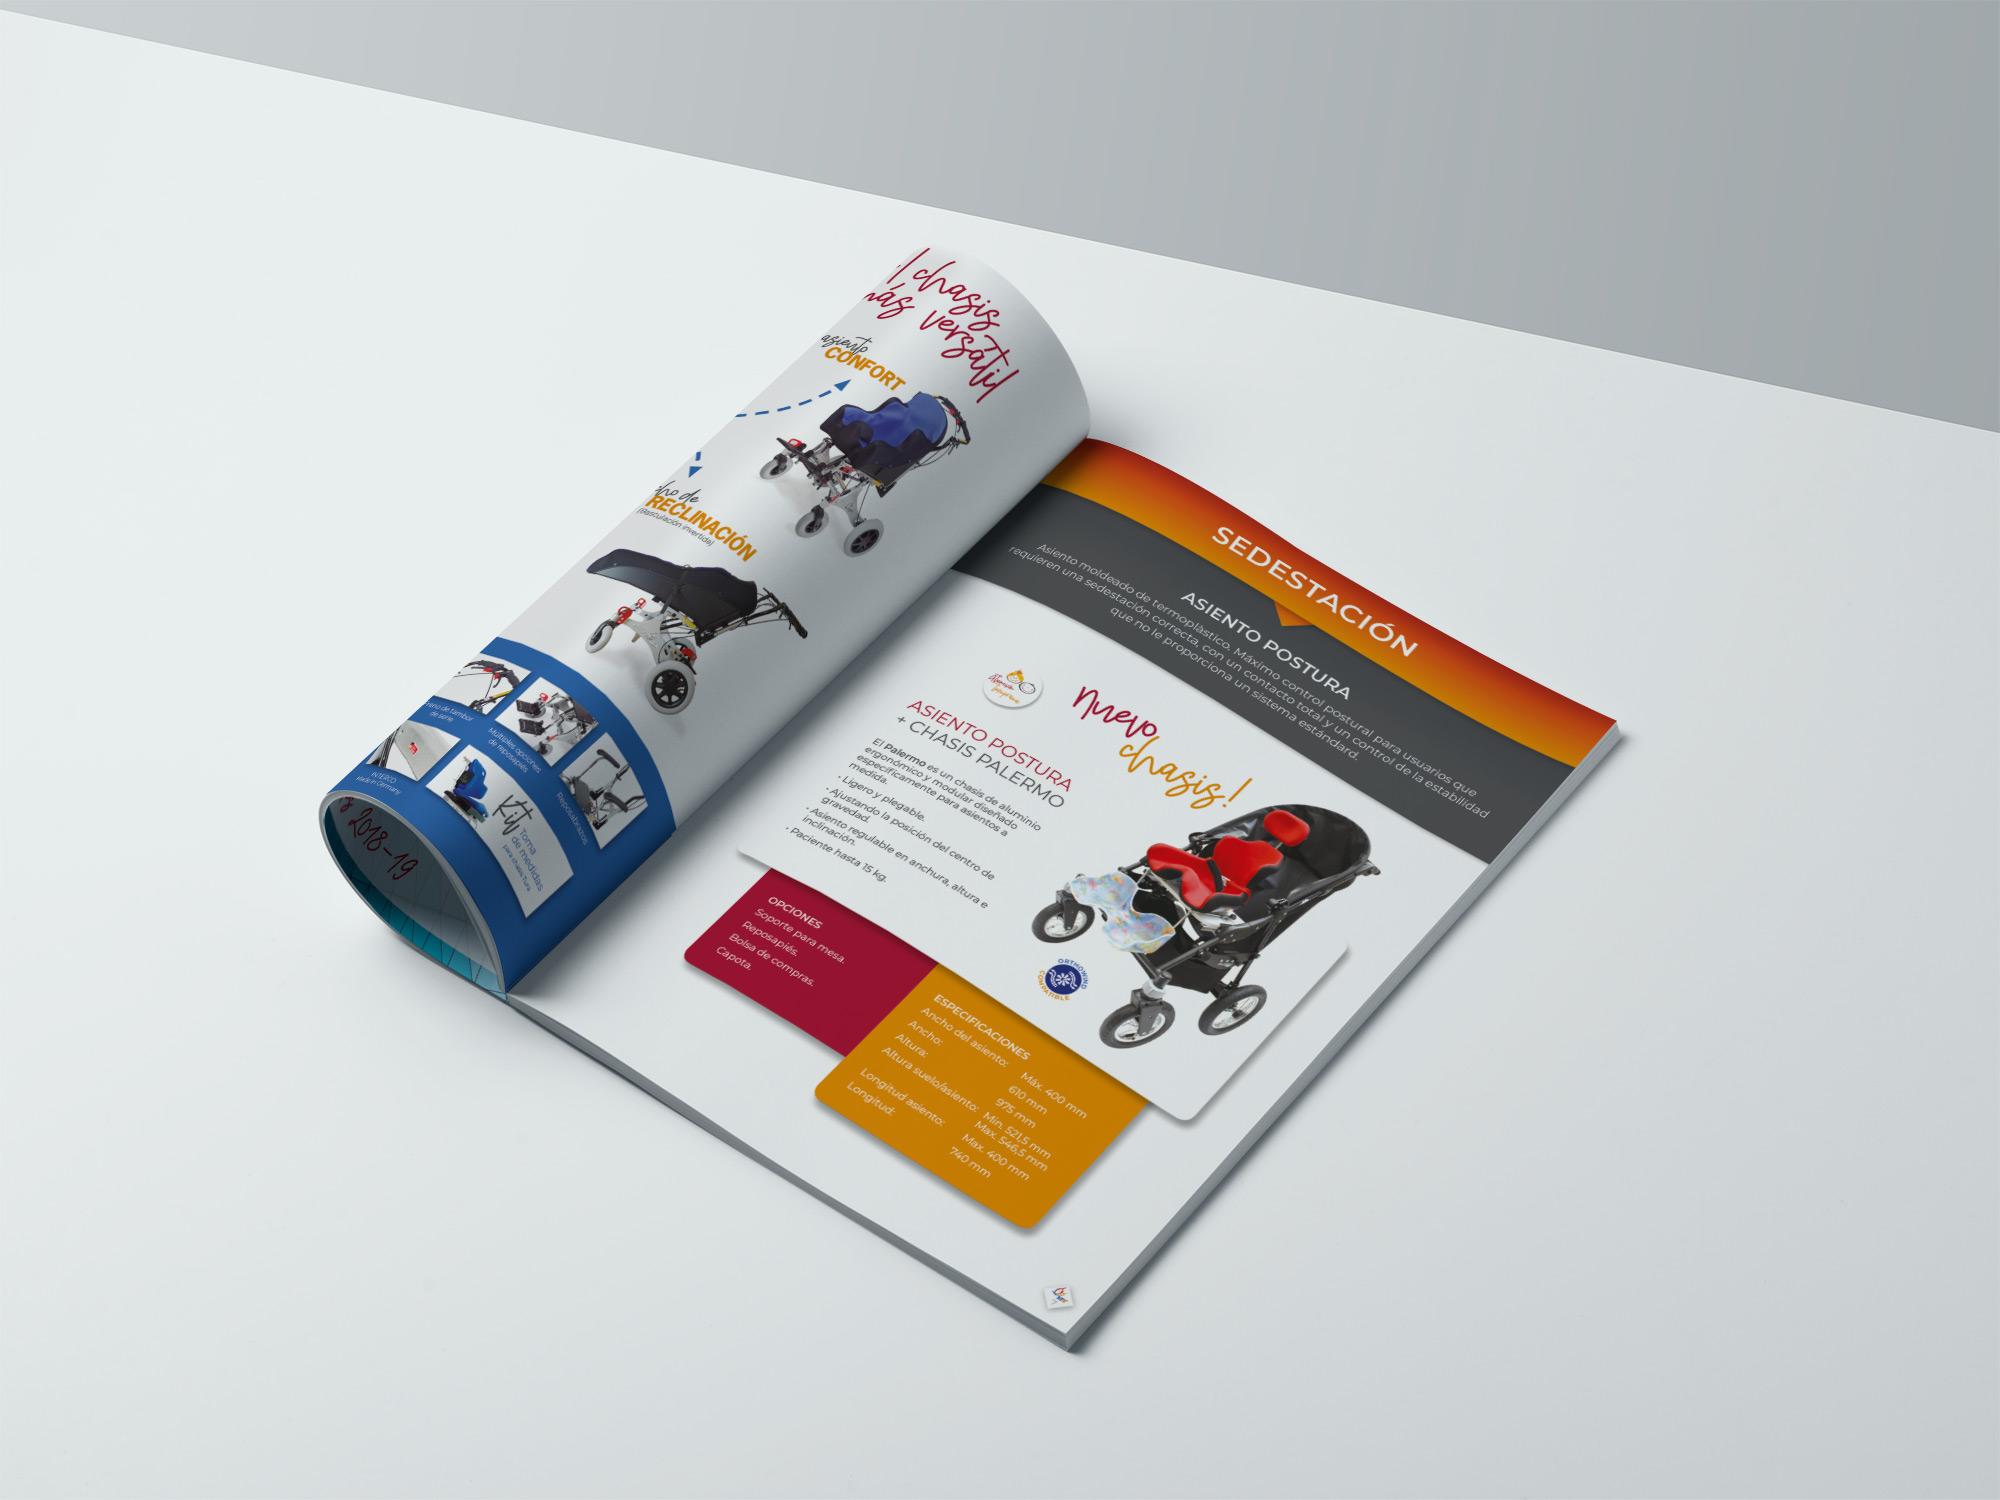 Catàleg Handy Free Solutions 4